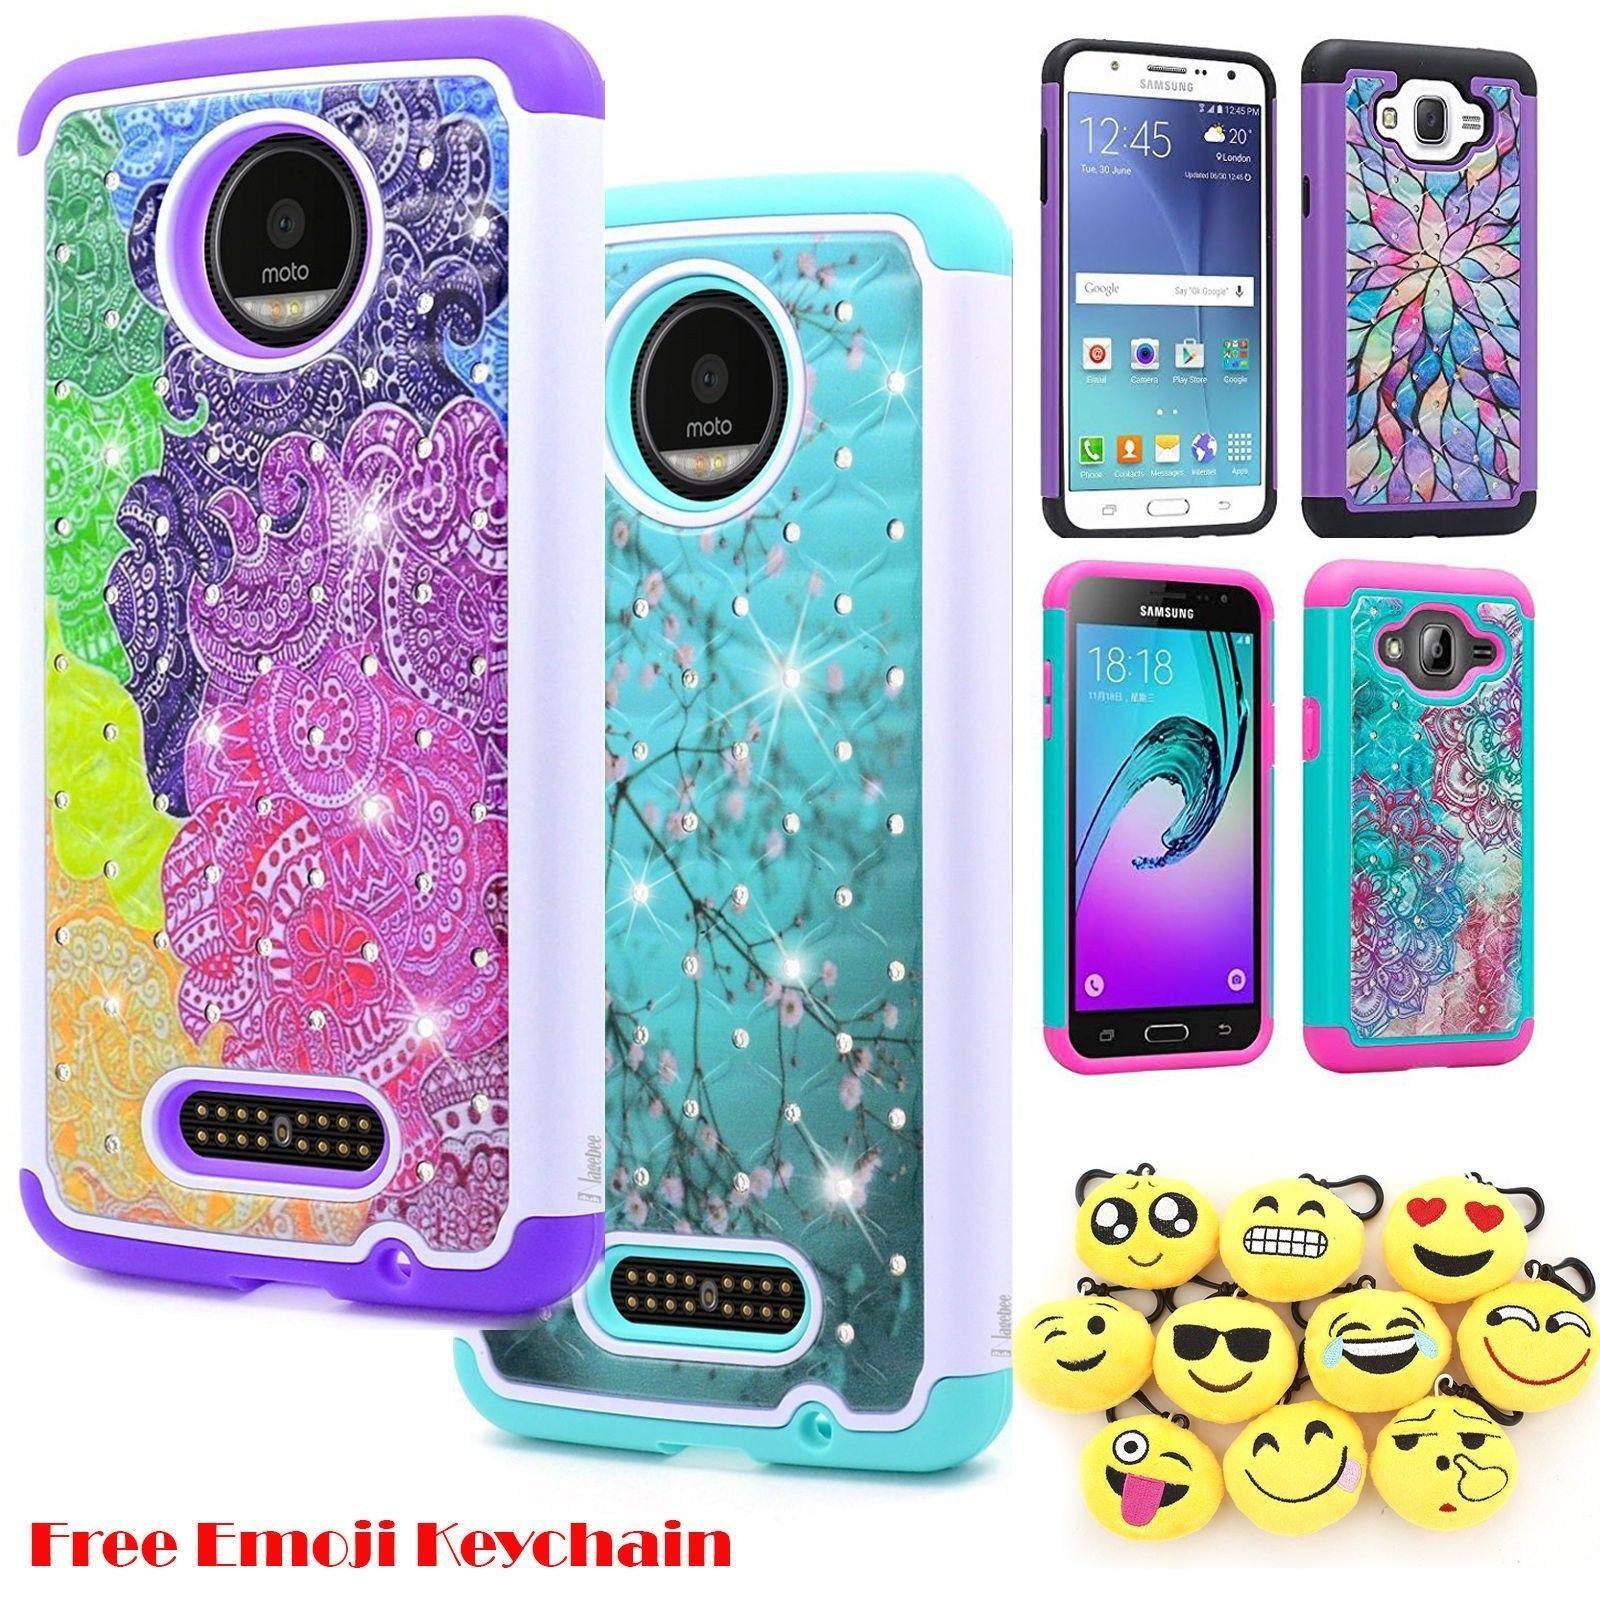 6a0dd2979ce Motorola Moto E4 Hybrid Hard Diamond Bling Phone Case Protective Cover +  Emoji